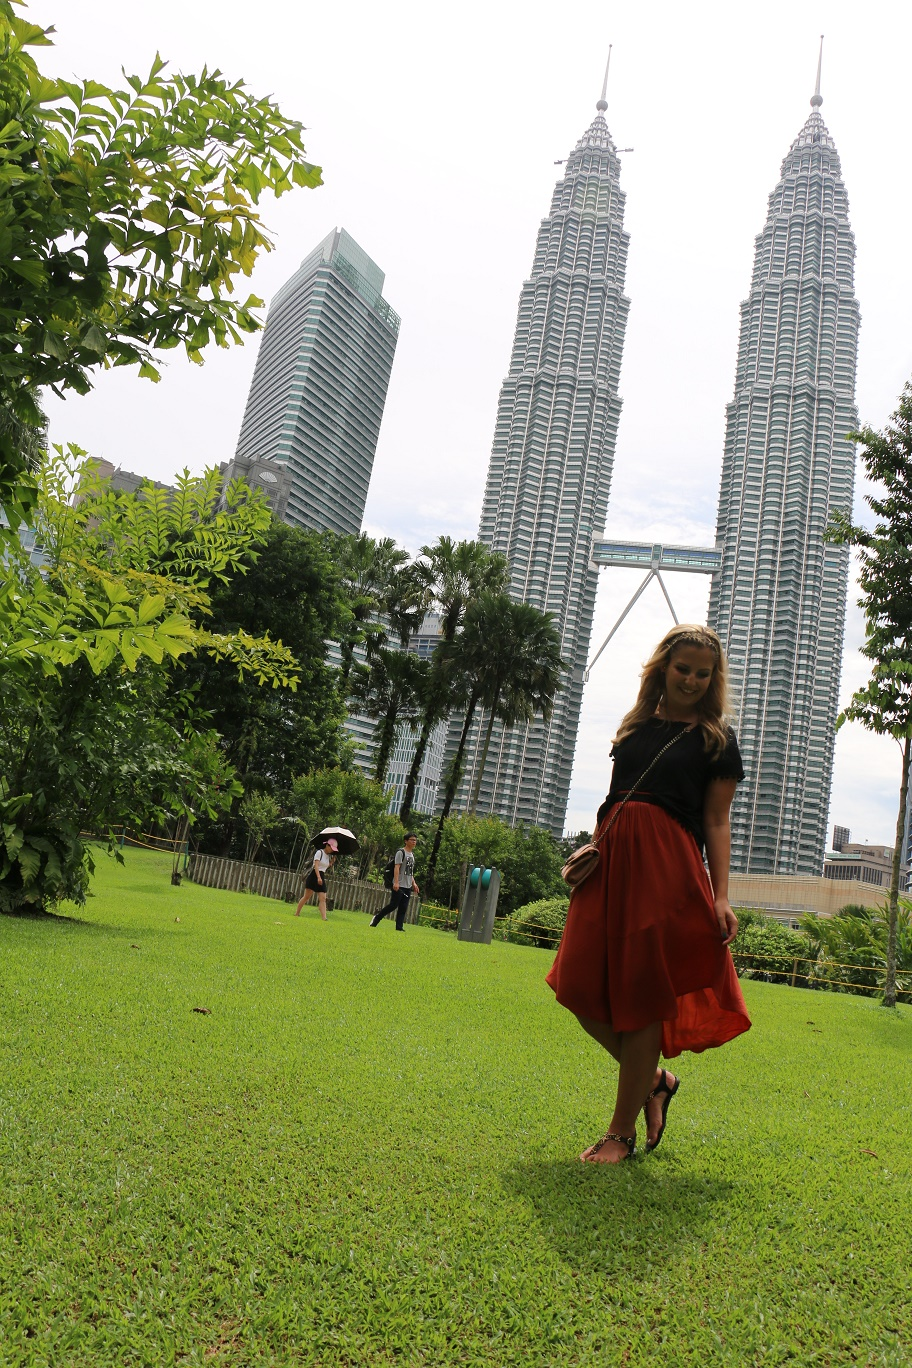 Kuala_Lumpur_KLCC_Park_thebraidedgirl